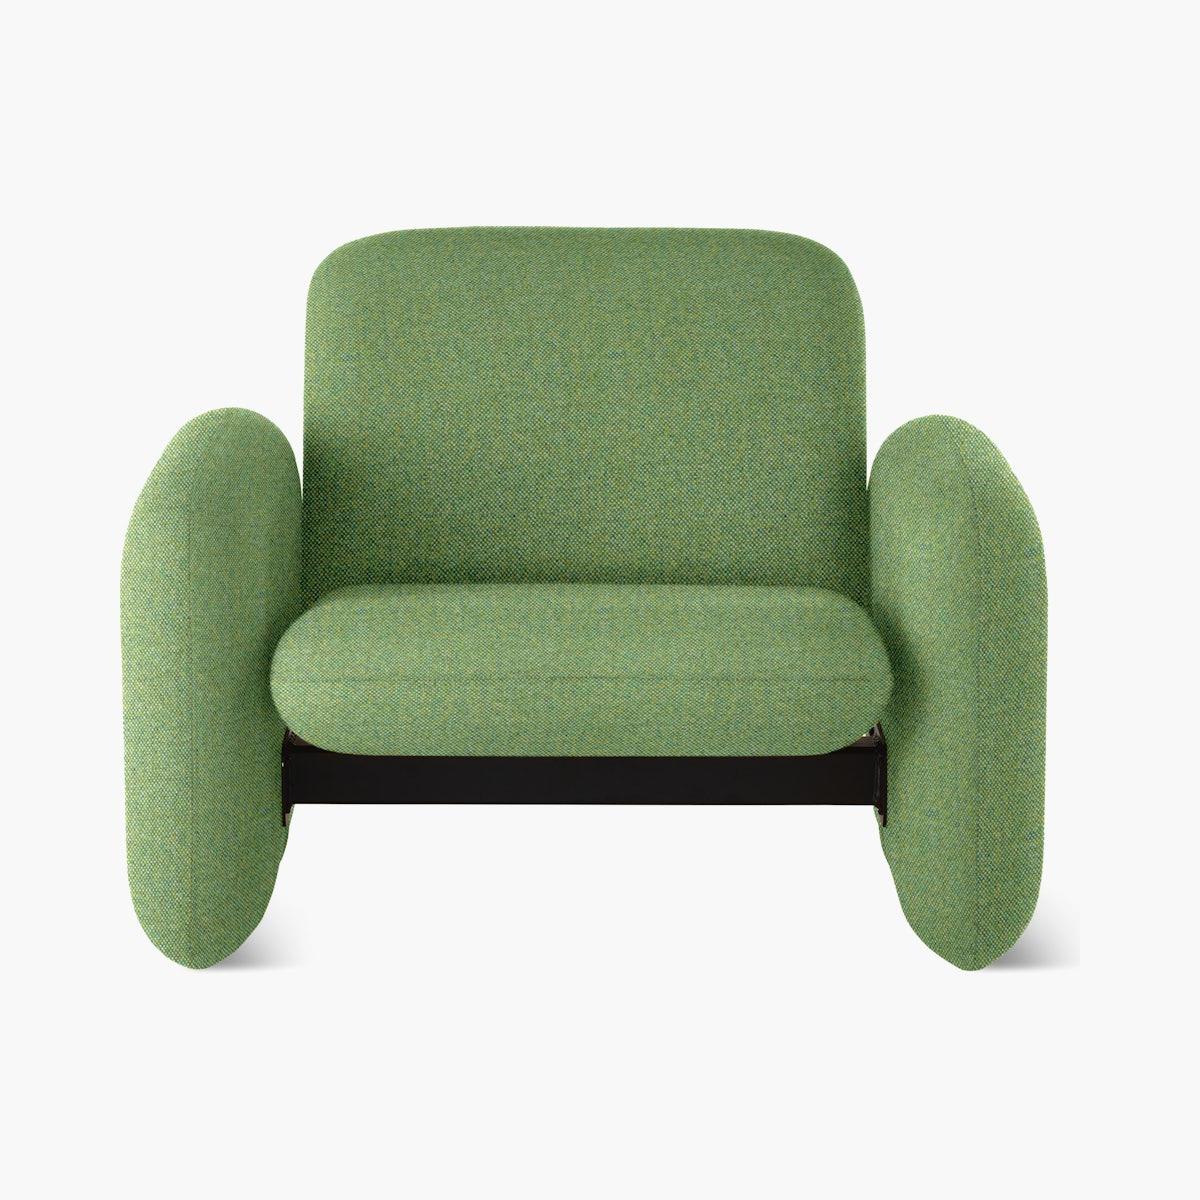 Wilkes Modular Sofa Group Chair